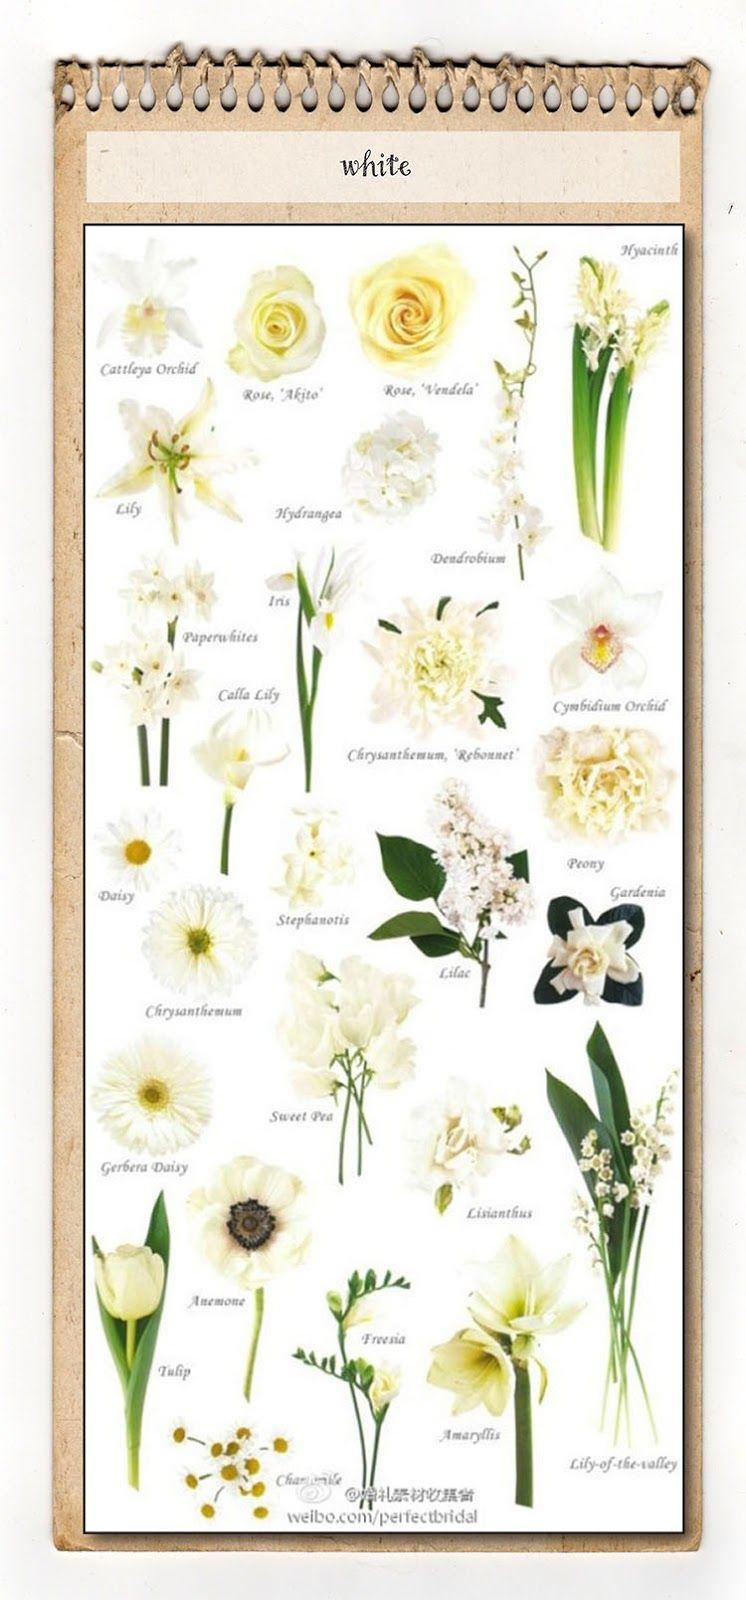 White Flower Chart Helpful Tools Pinterest Wedding Flowers